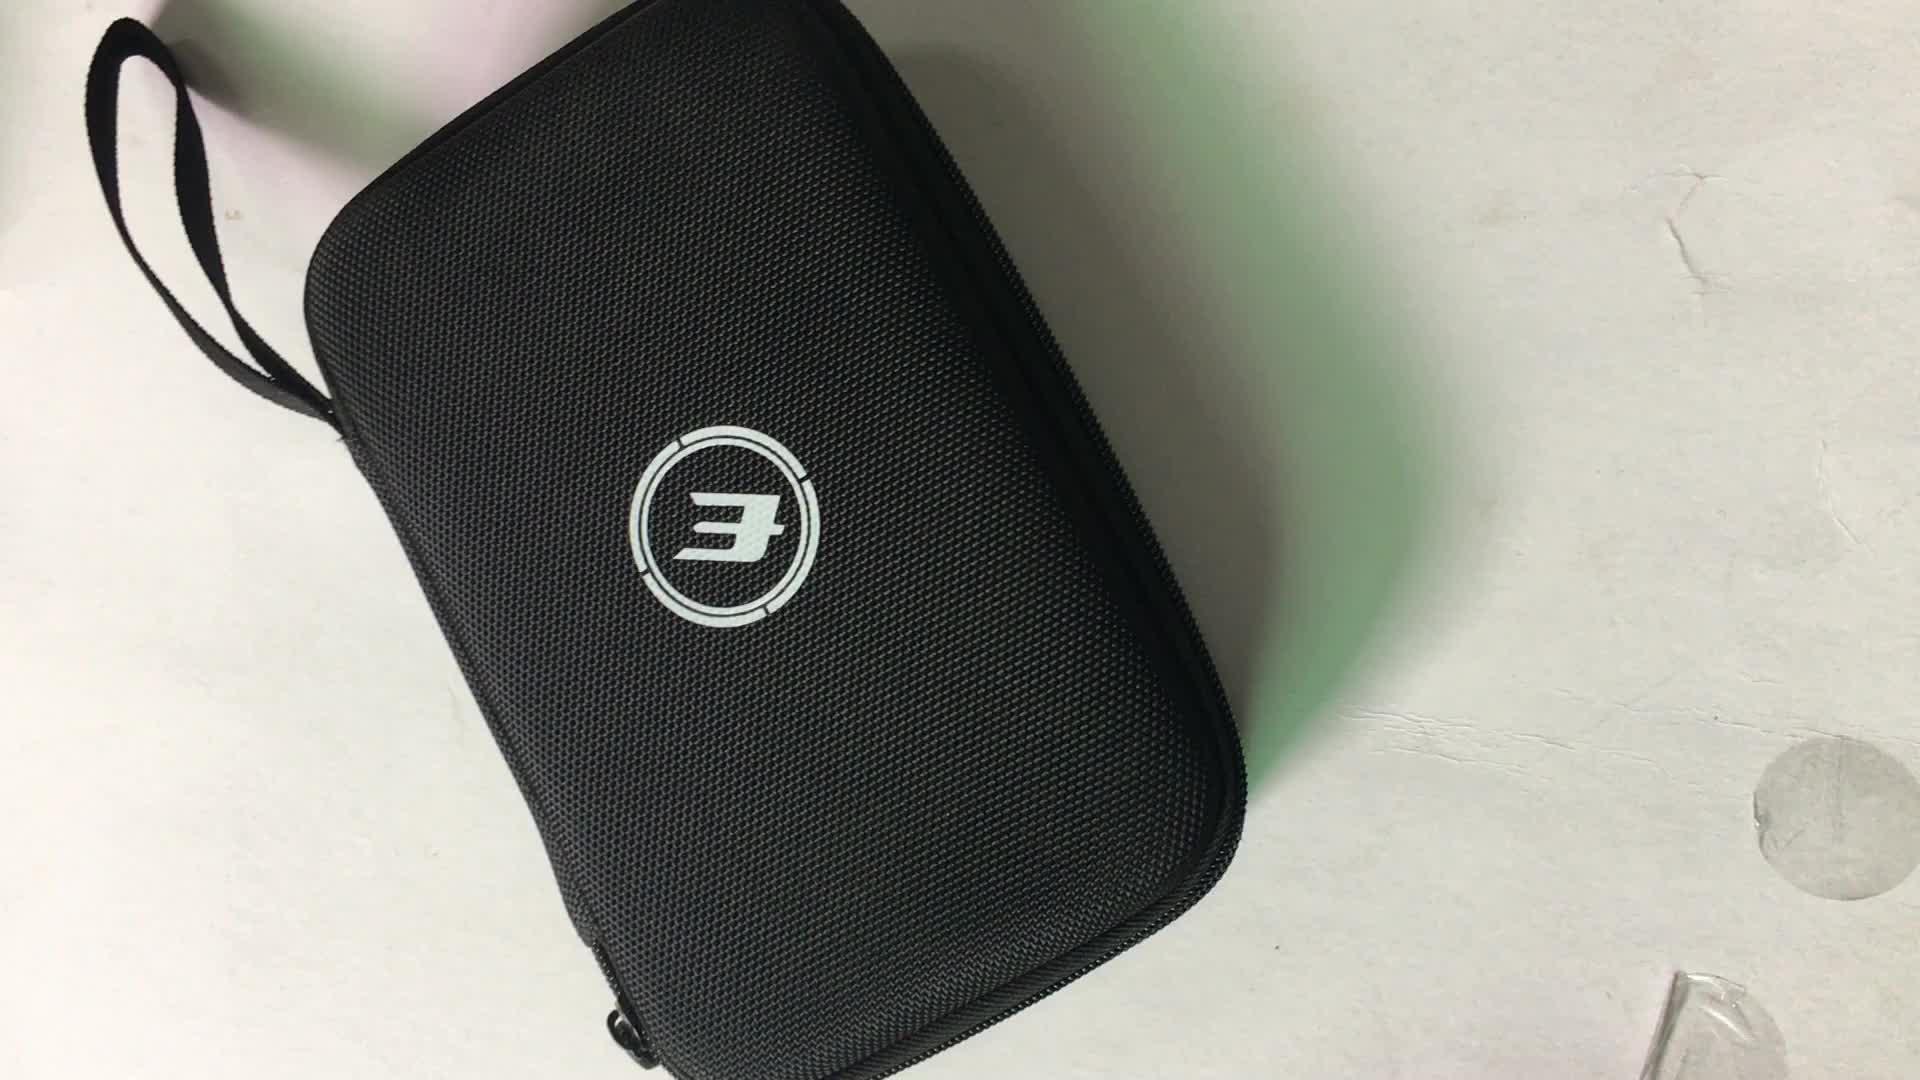 GC- EVA hard case with oxford fabric eva Foam protection case